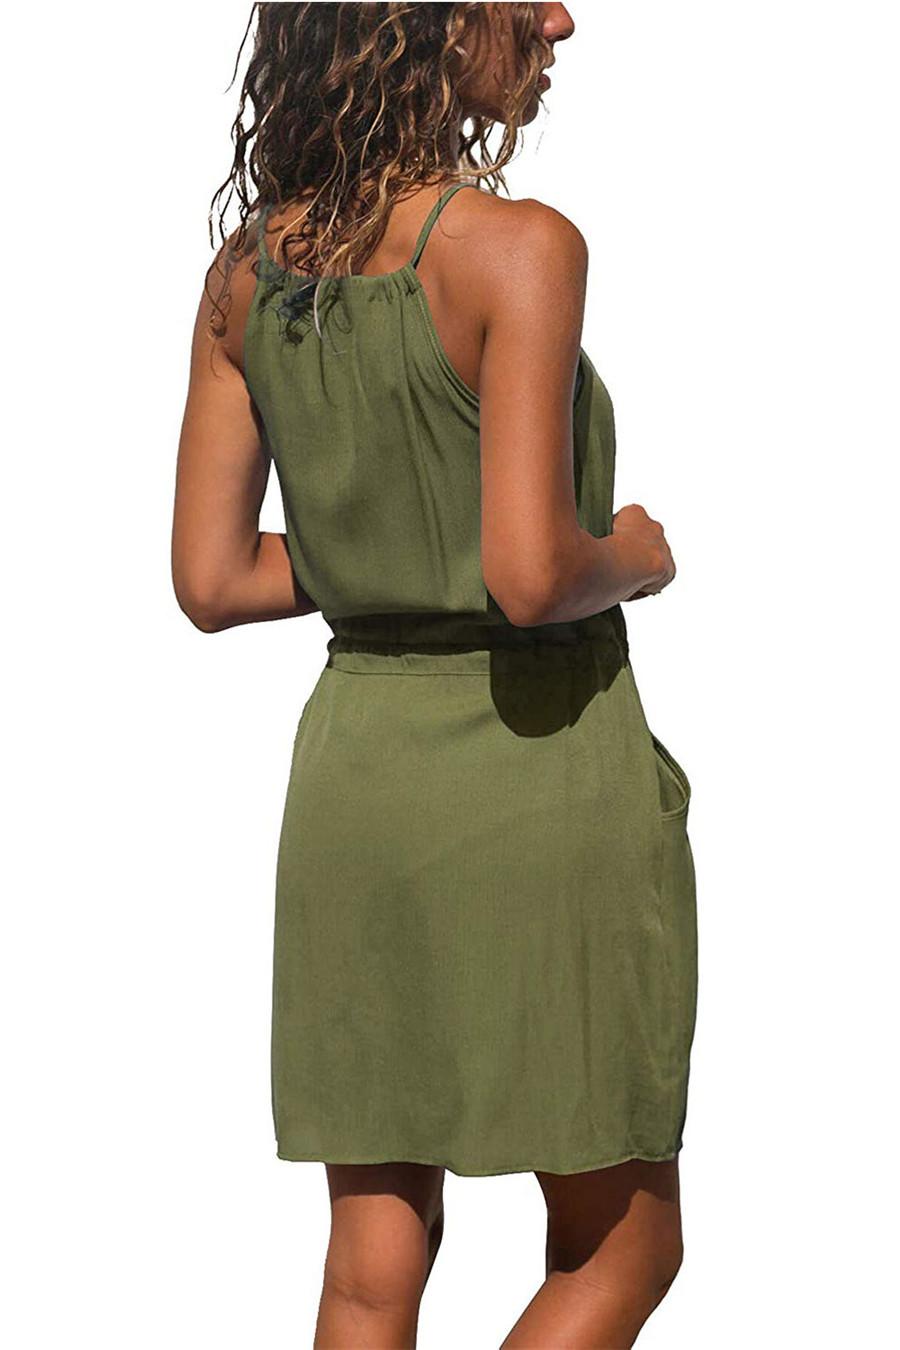 Gladiolus Chiffon Women Summer Dress Spaghetti Strap Floral Print Pocket Sexy Bohemian Beach Dress 2019 Short Ladies Dresses (49)